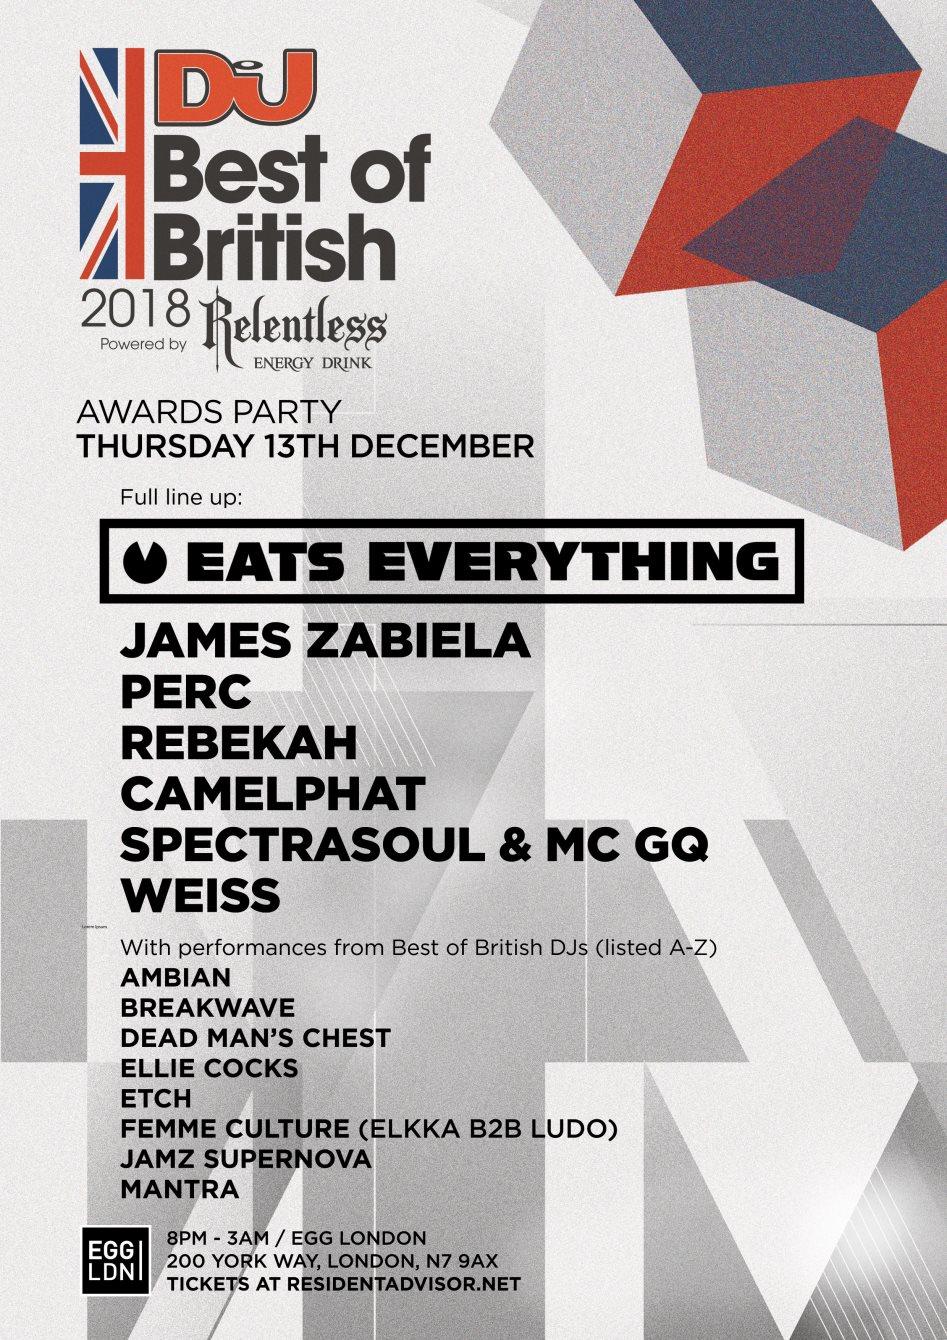 DJ Mag – Best of British Awards – Full Line Up